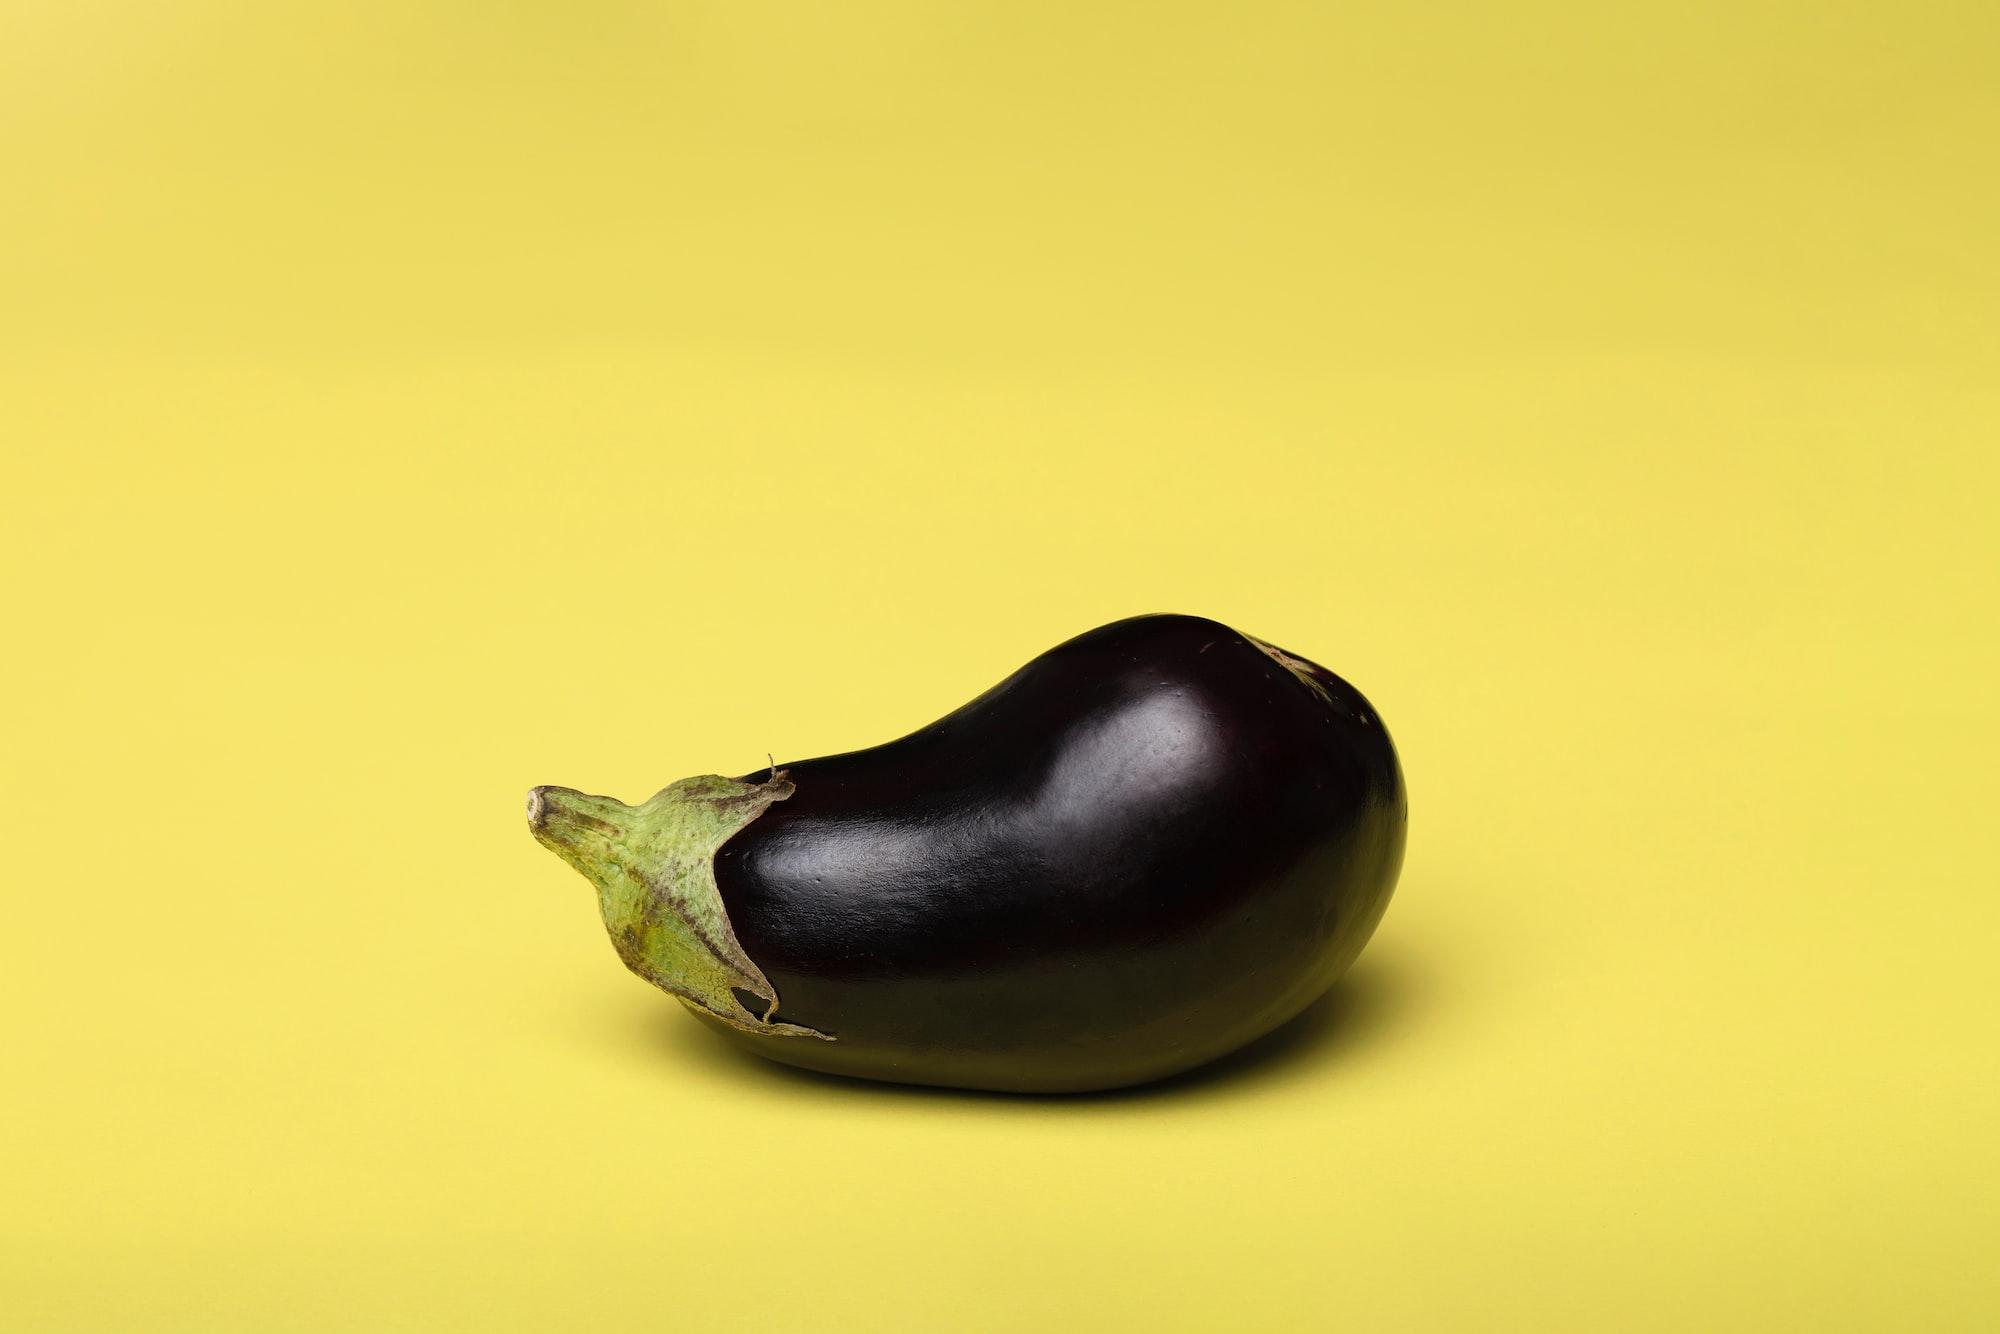 Aubergine is a purple rainbow food by Deon Black for Unsplash